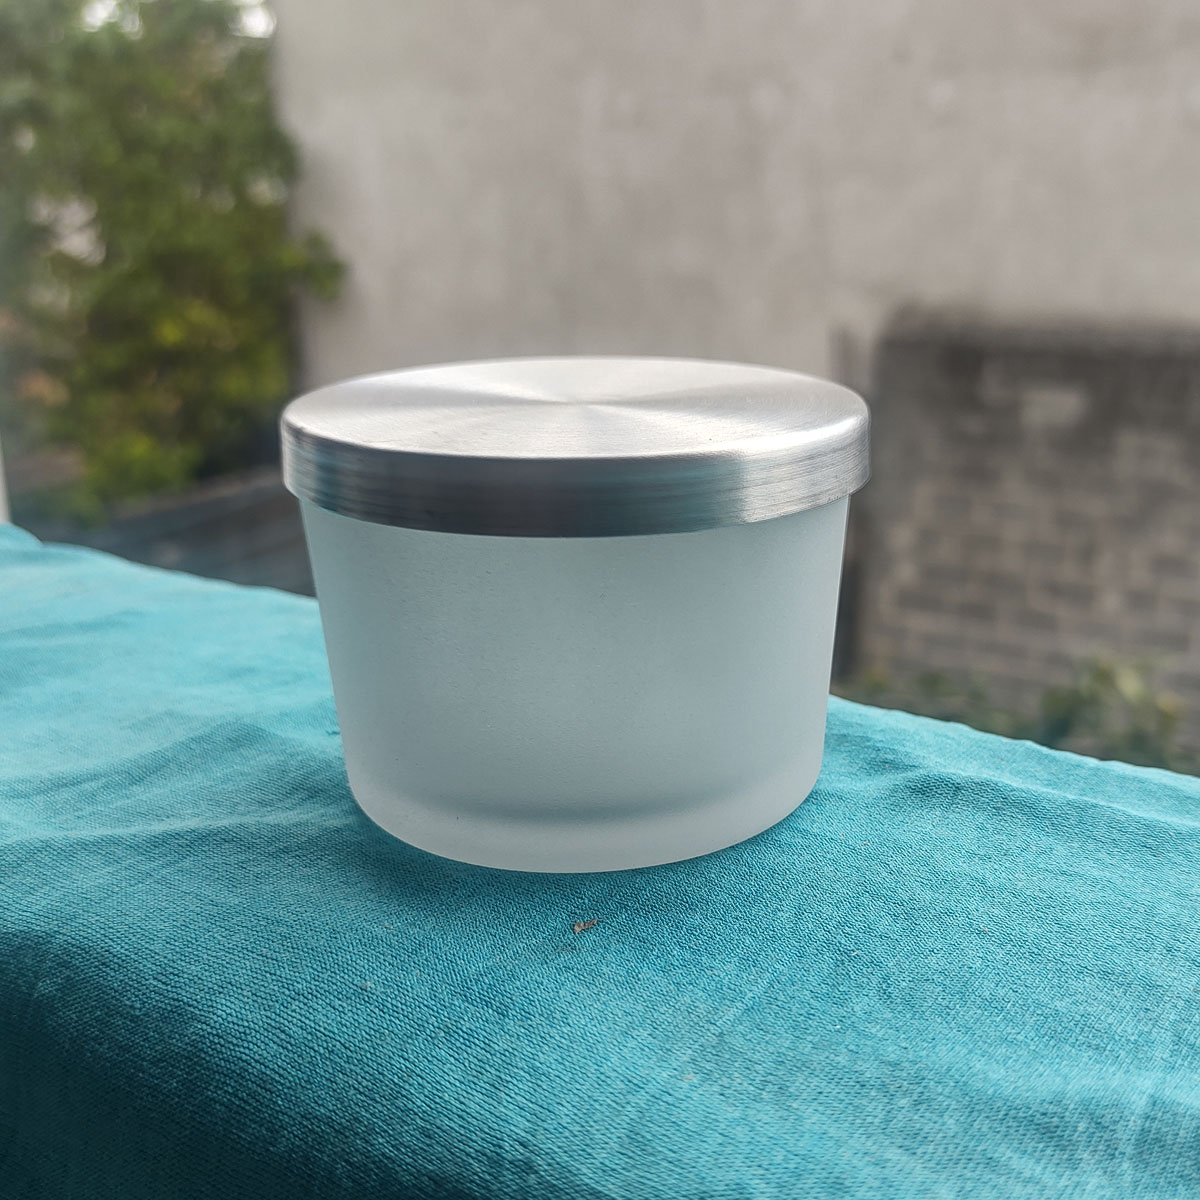 Pote Patê de Vidro Jateado Com Tampa de Aluminio 150ml - 10 unid.